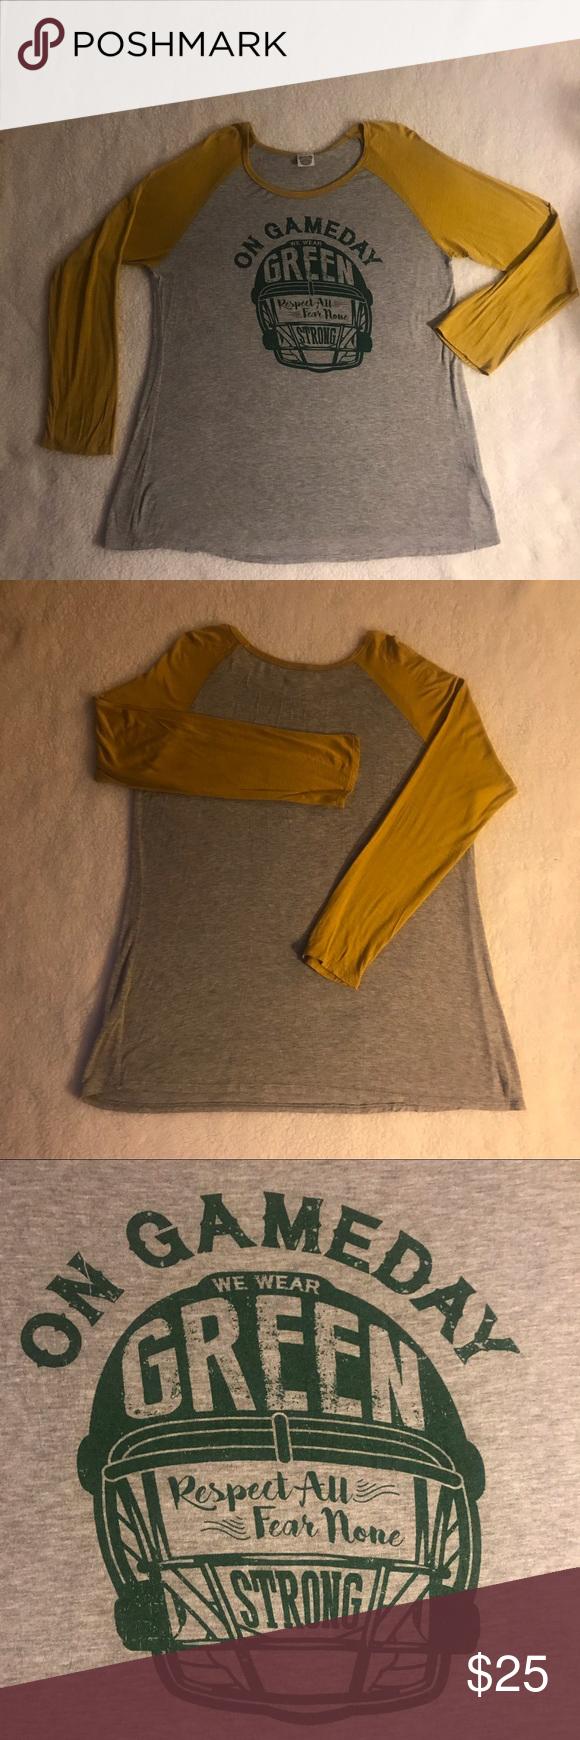 Green Bay Packers Euc Long Sleeved T Shirt With Images Gold T Shirts Long Sleeve Tshirt Clothes Design